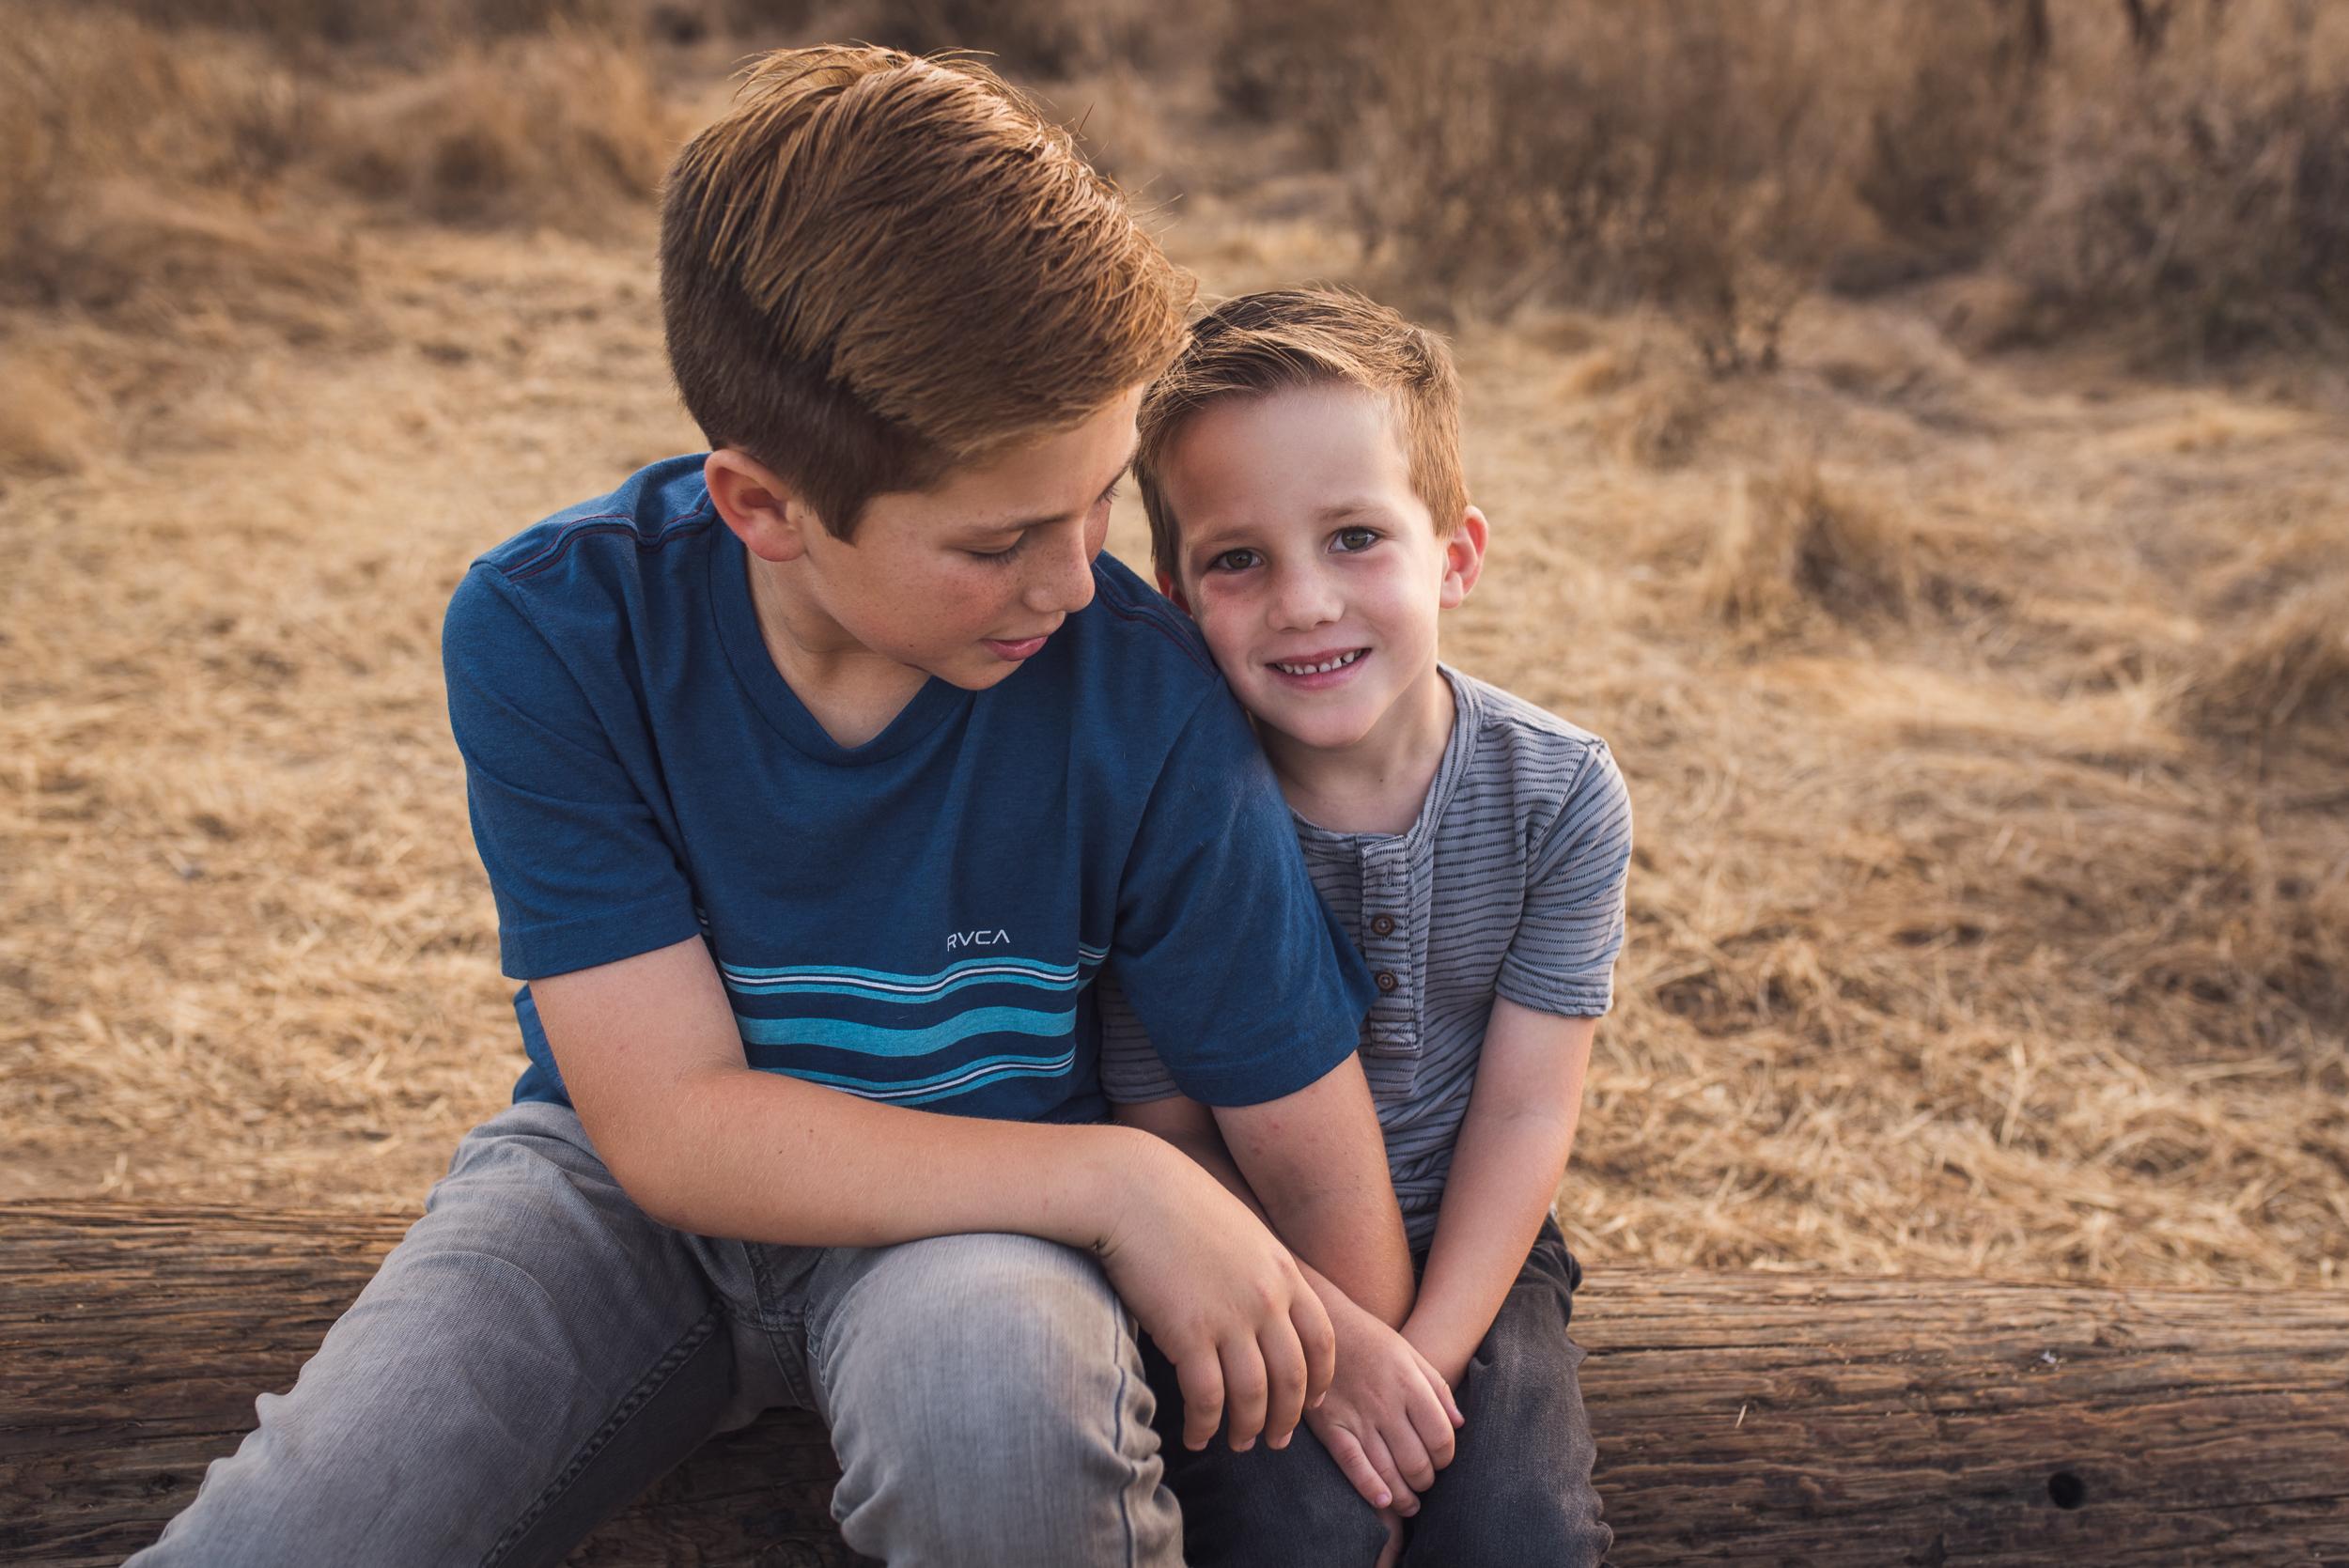 2018-San-Diego-Family-Lifestyle-Newborn-Travel-Vacation-Photographer-Kelsey-Smith-Photography-Coronado-La-Jolla-Encinitas-Solana-Beach-Del-Mar-74.jpg